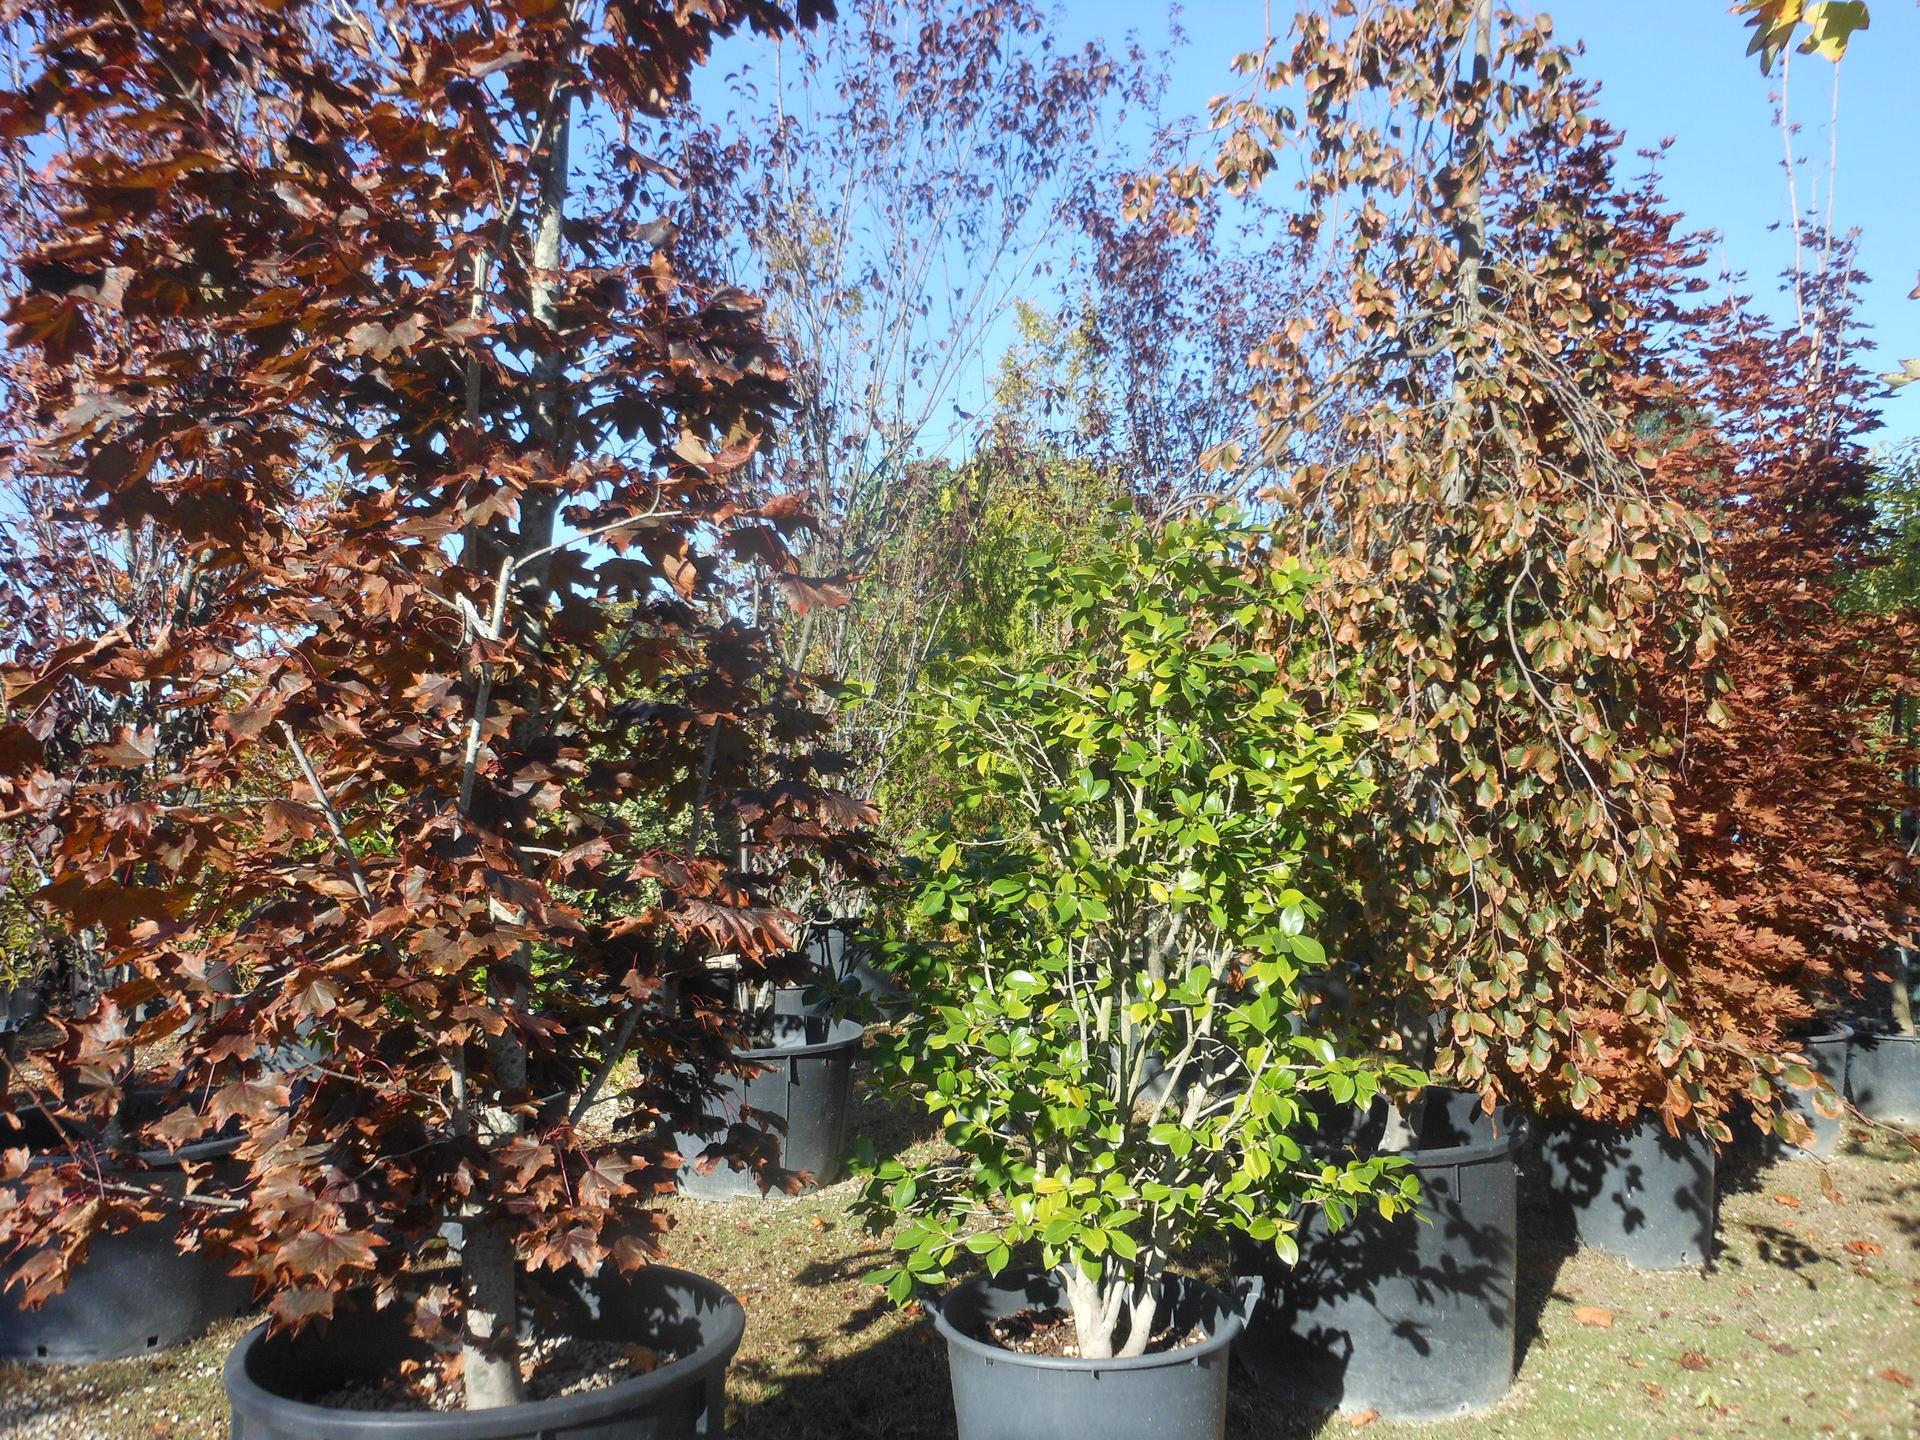 Manutenzione giardini pesaro pu vivaio verde mondo - Piante alto fusto da giardino ...